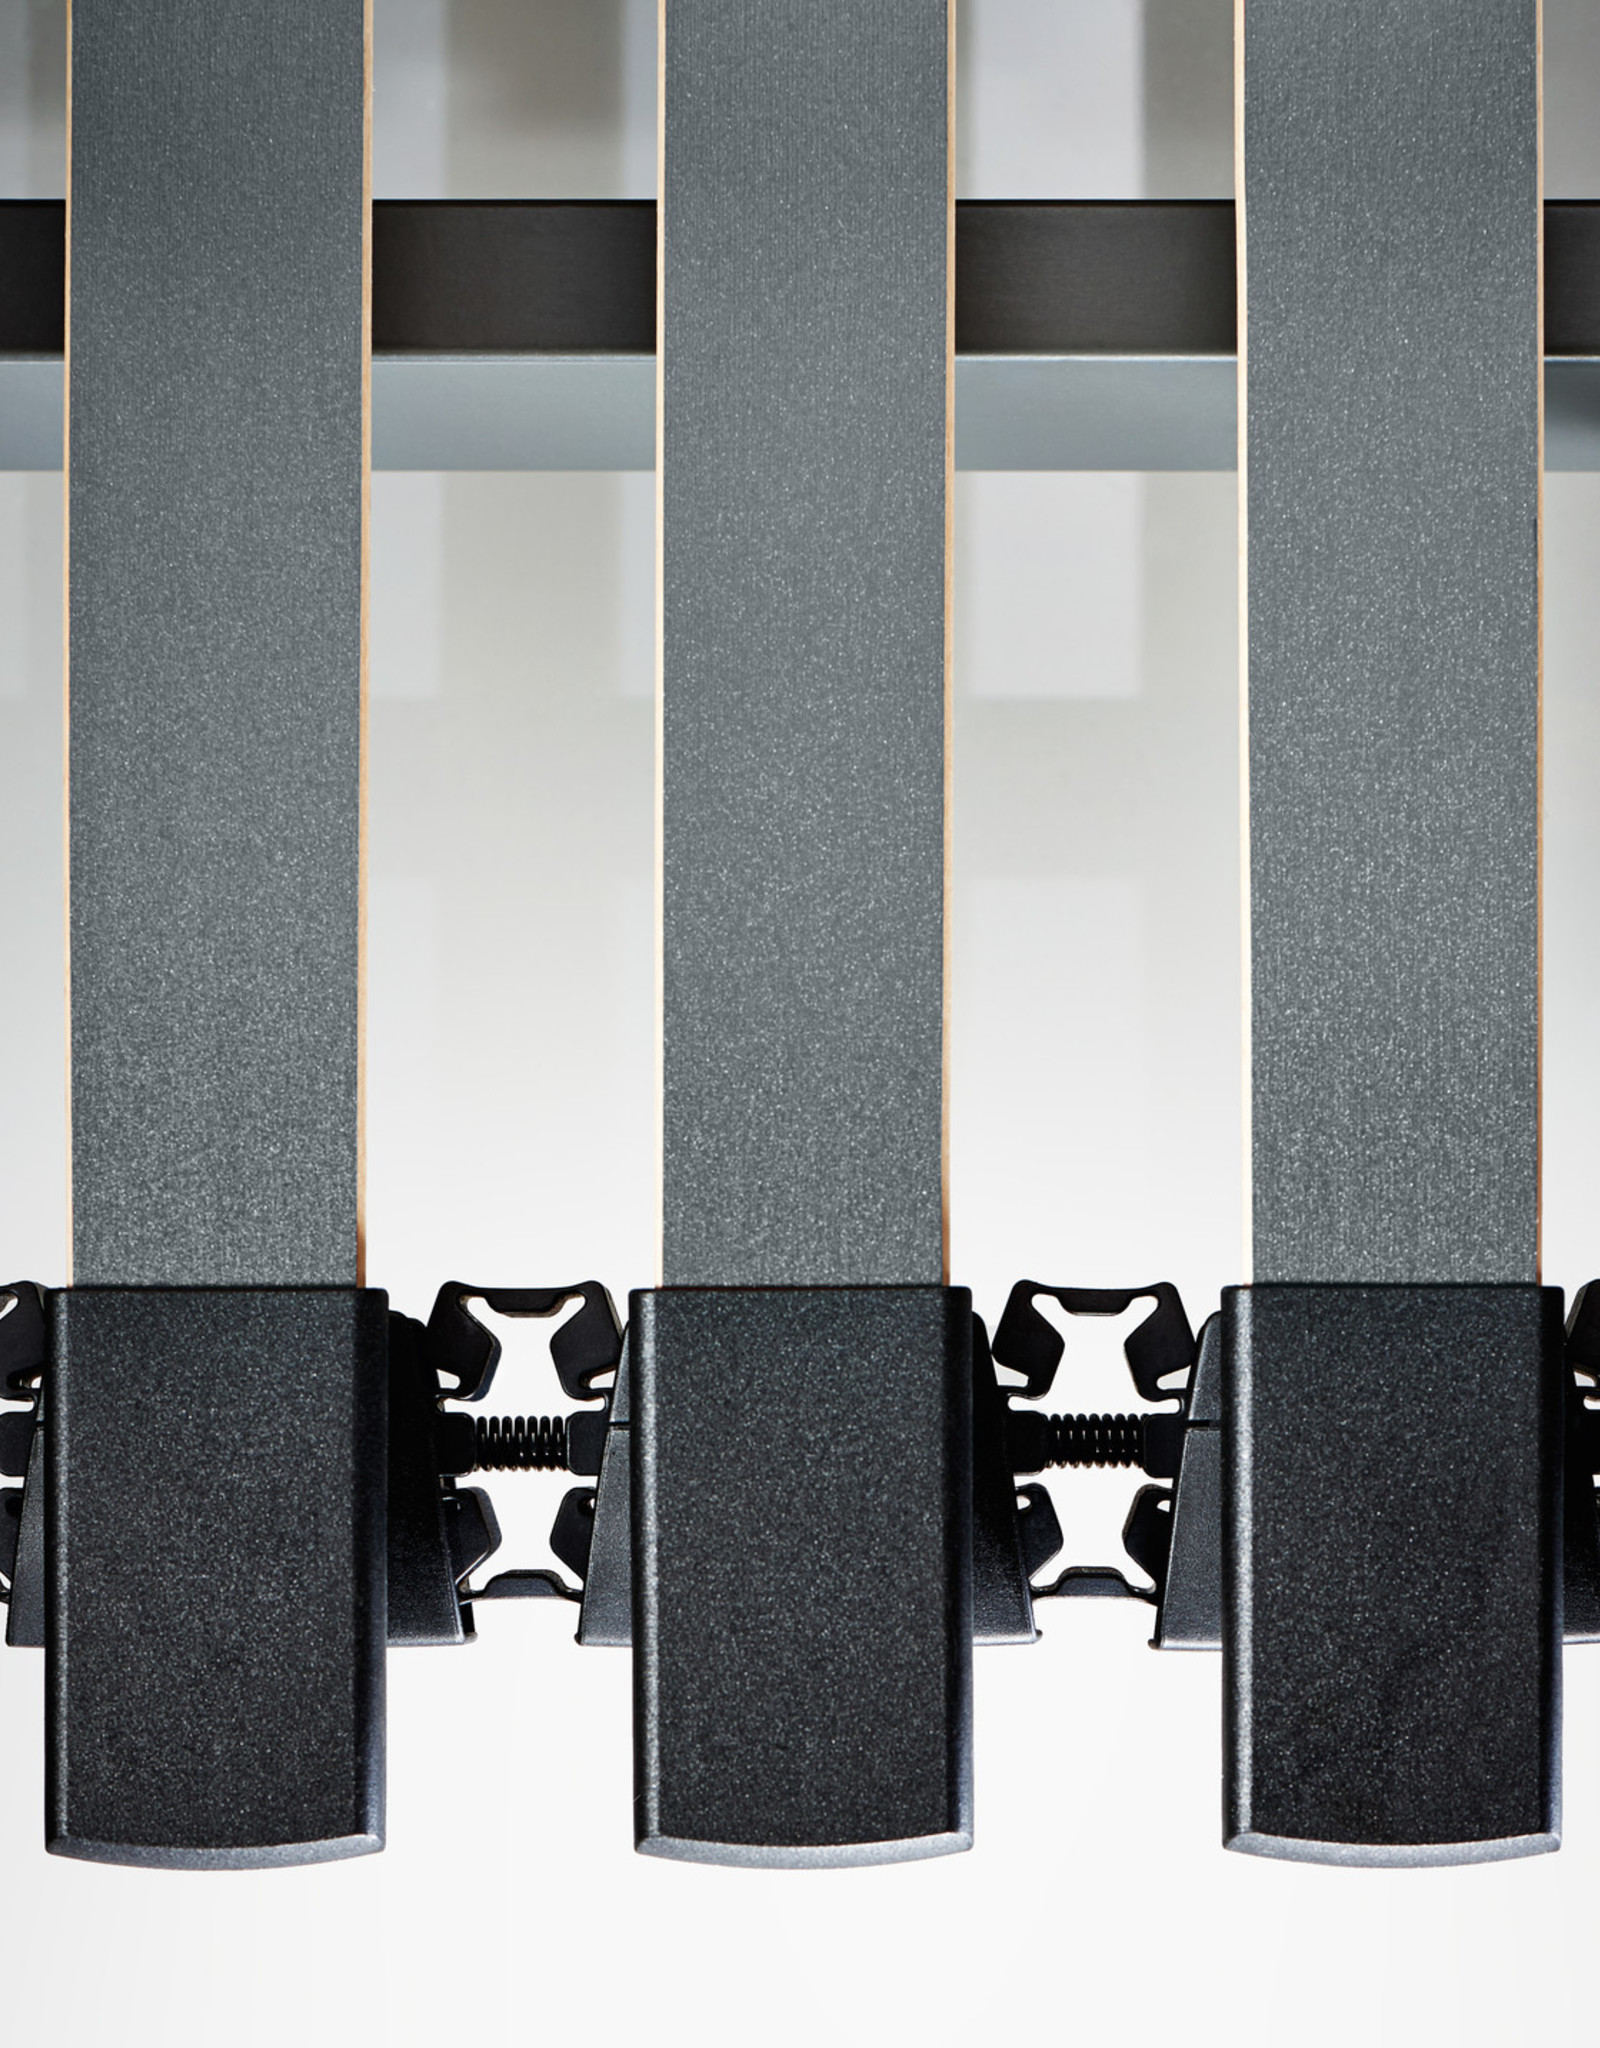 Swissflex Lattenbodem Uni 22-25 hoofd & voet